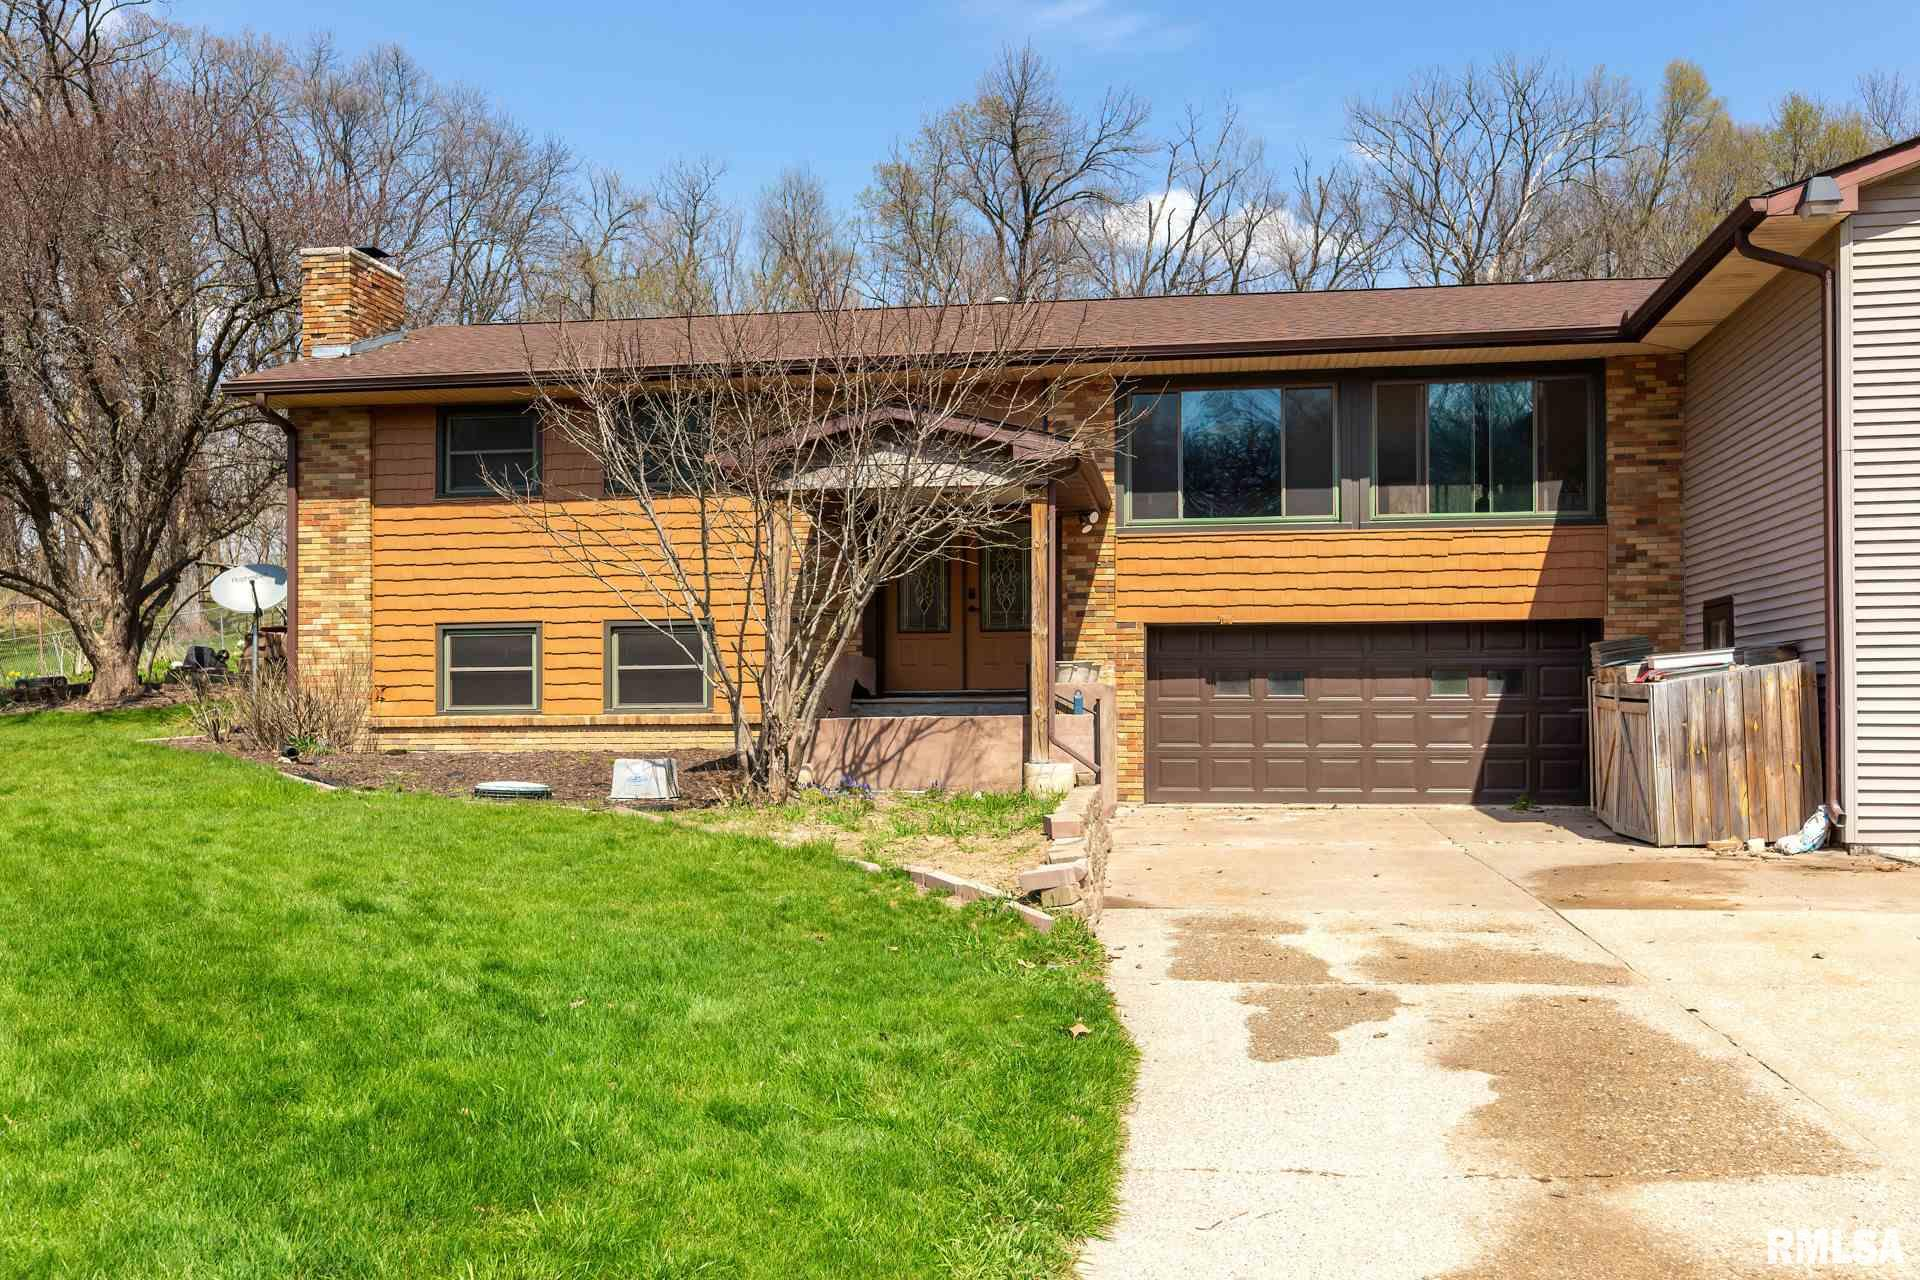 12027 NIABI ZOO Property Photo - Coal Valley, IL real estate listing